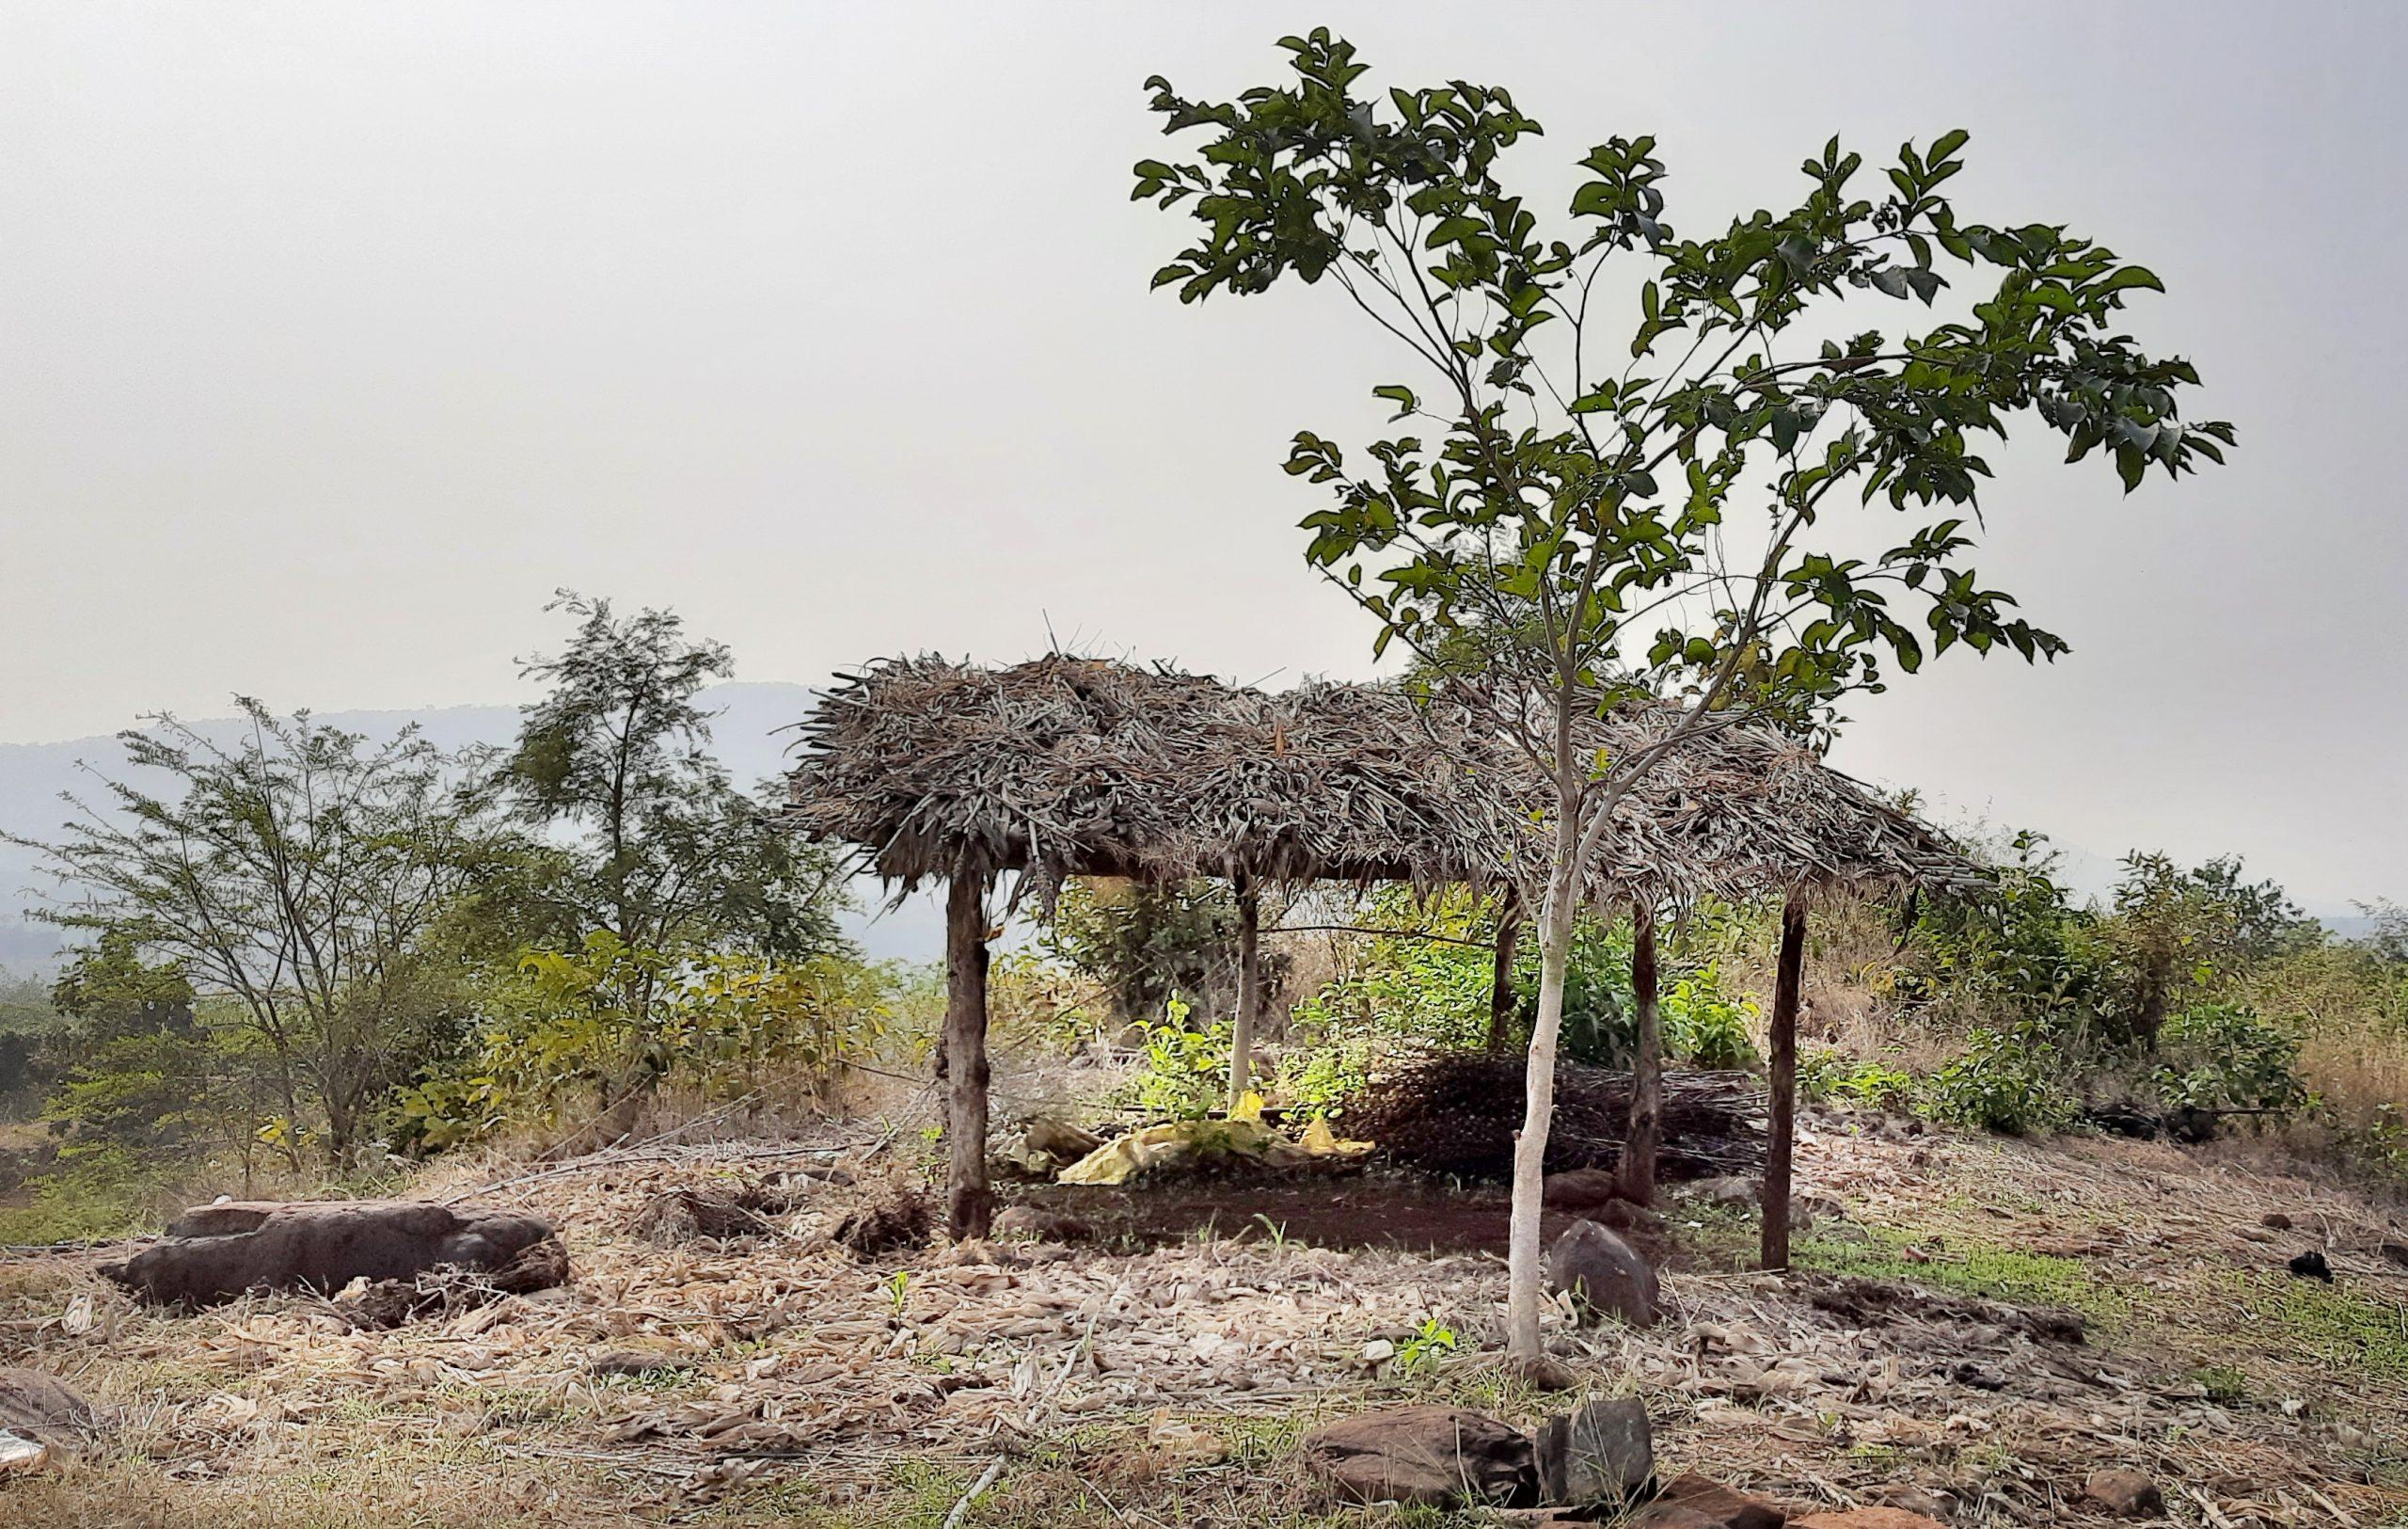 Hut and tree